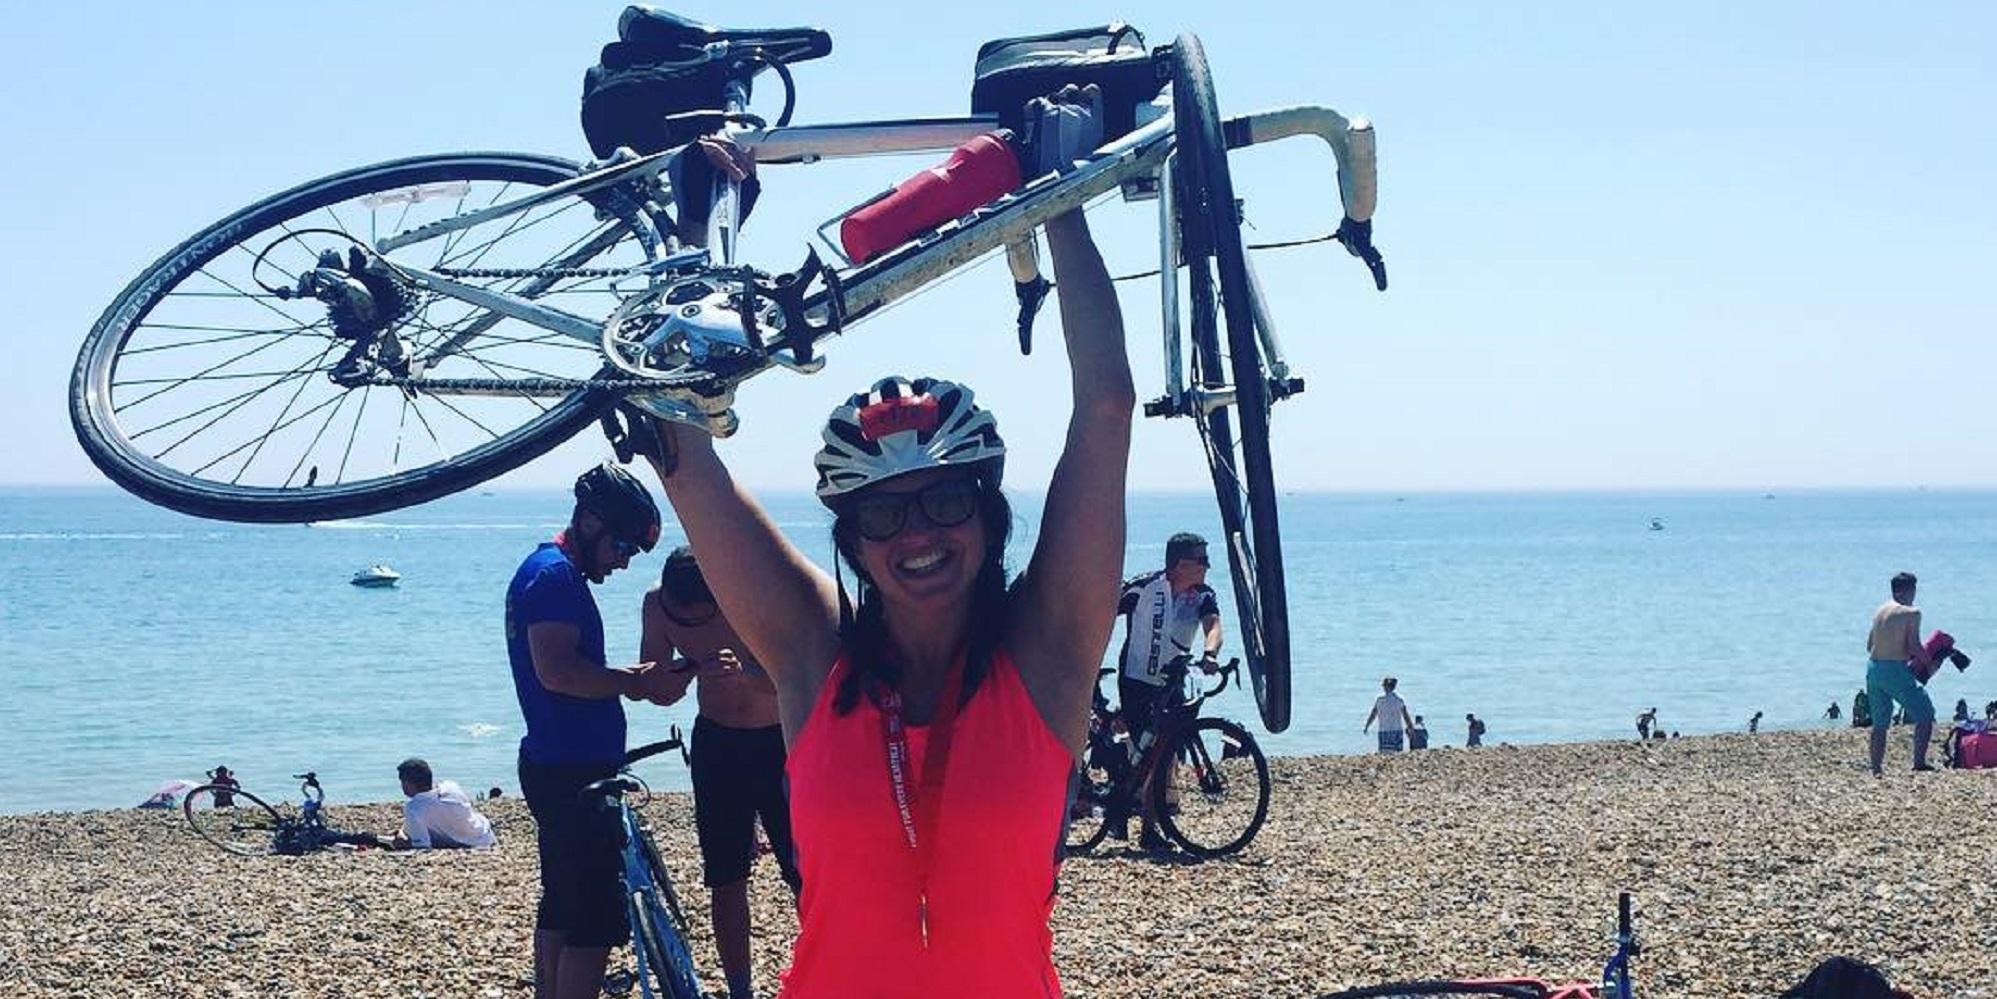 12. British Heart Foundation - London to Brighton Bike Ride